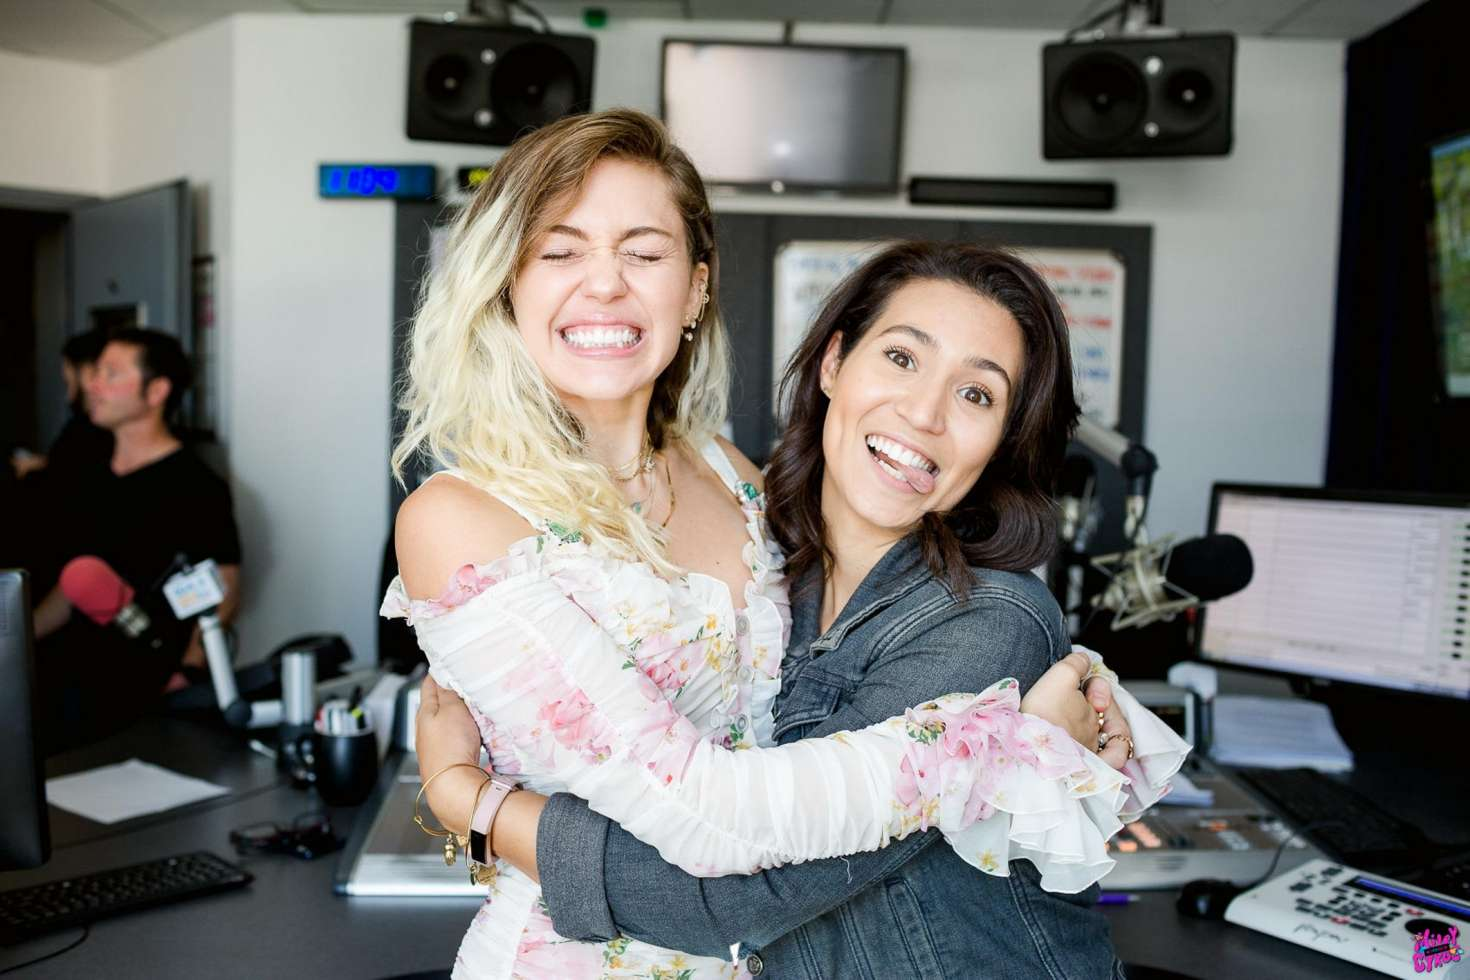 Miley Cyrus - Visiting 104.3 MYfm studios in Los Angeles